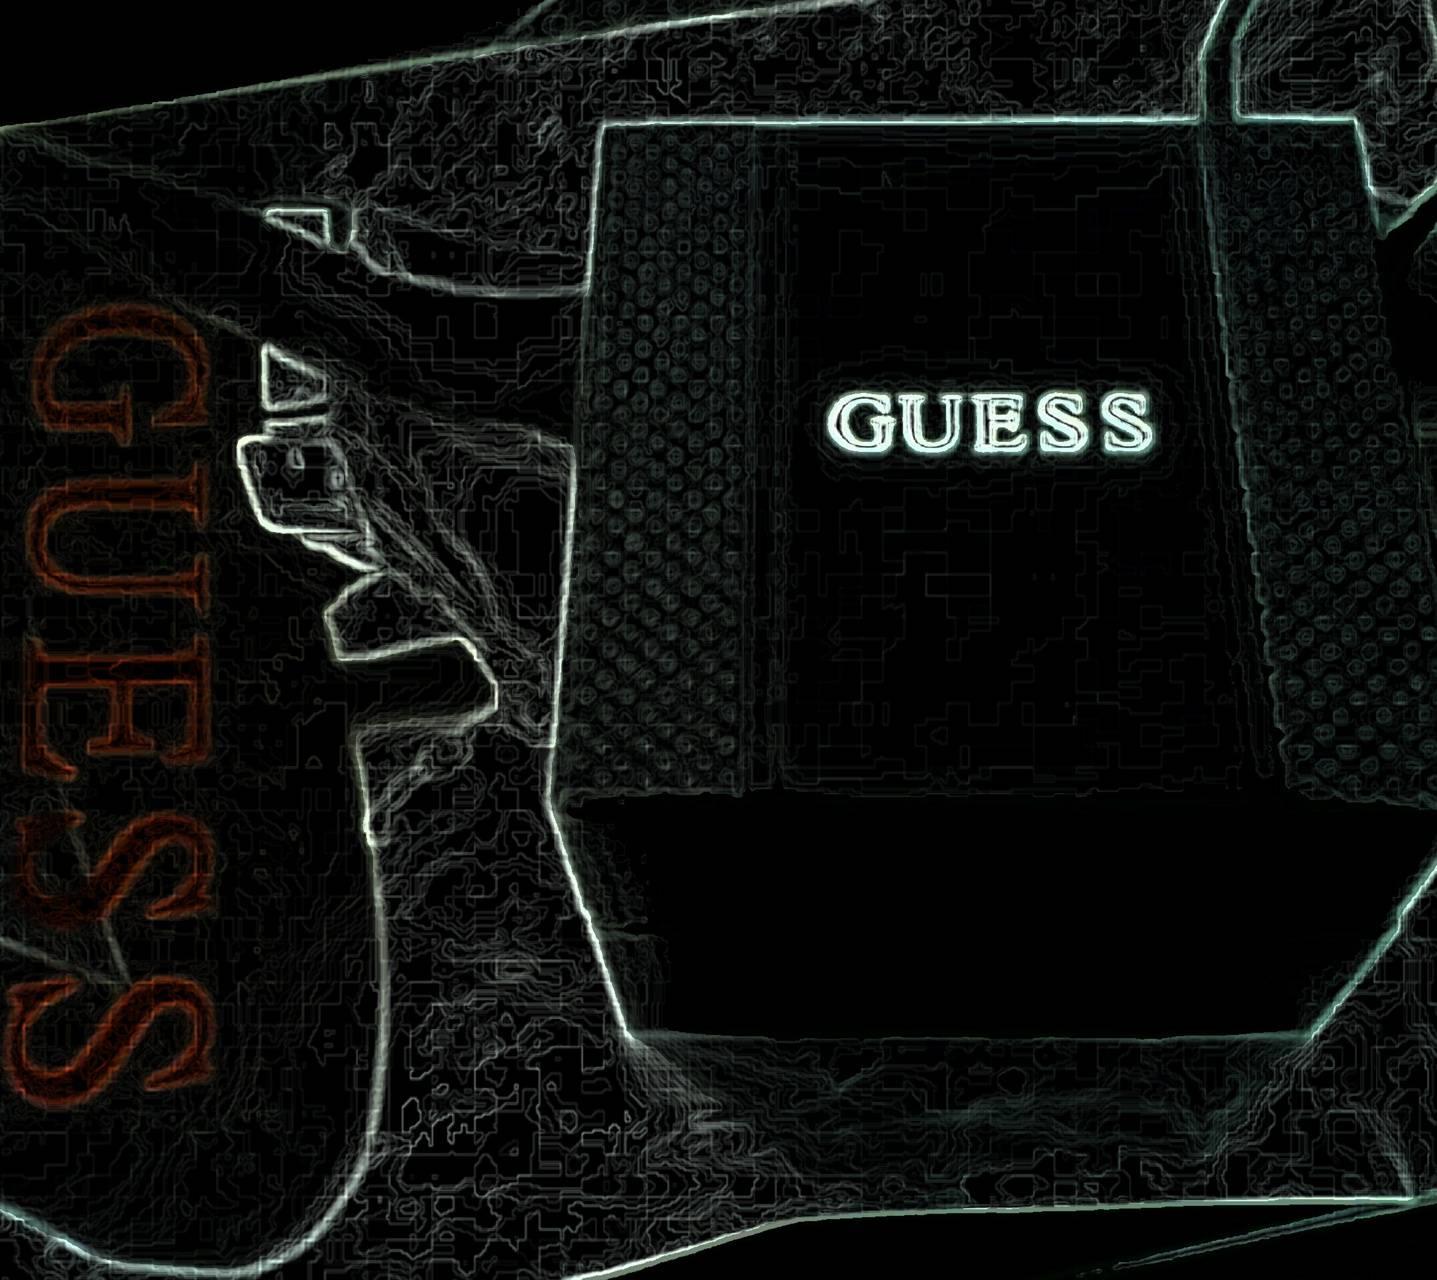 Guess box